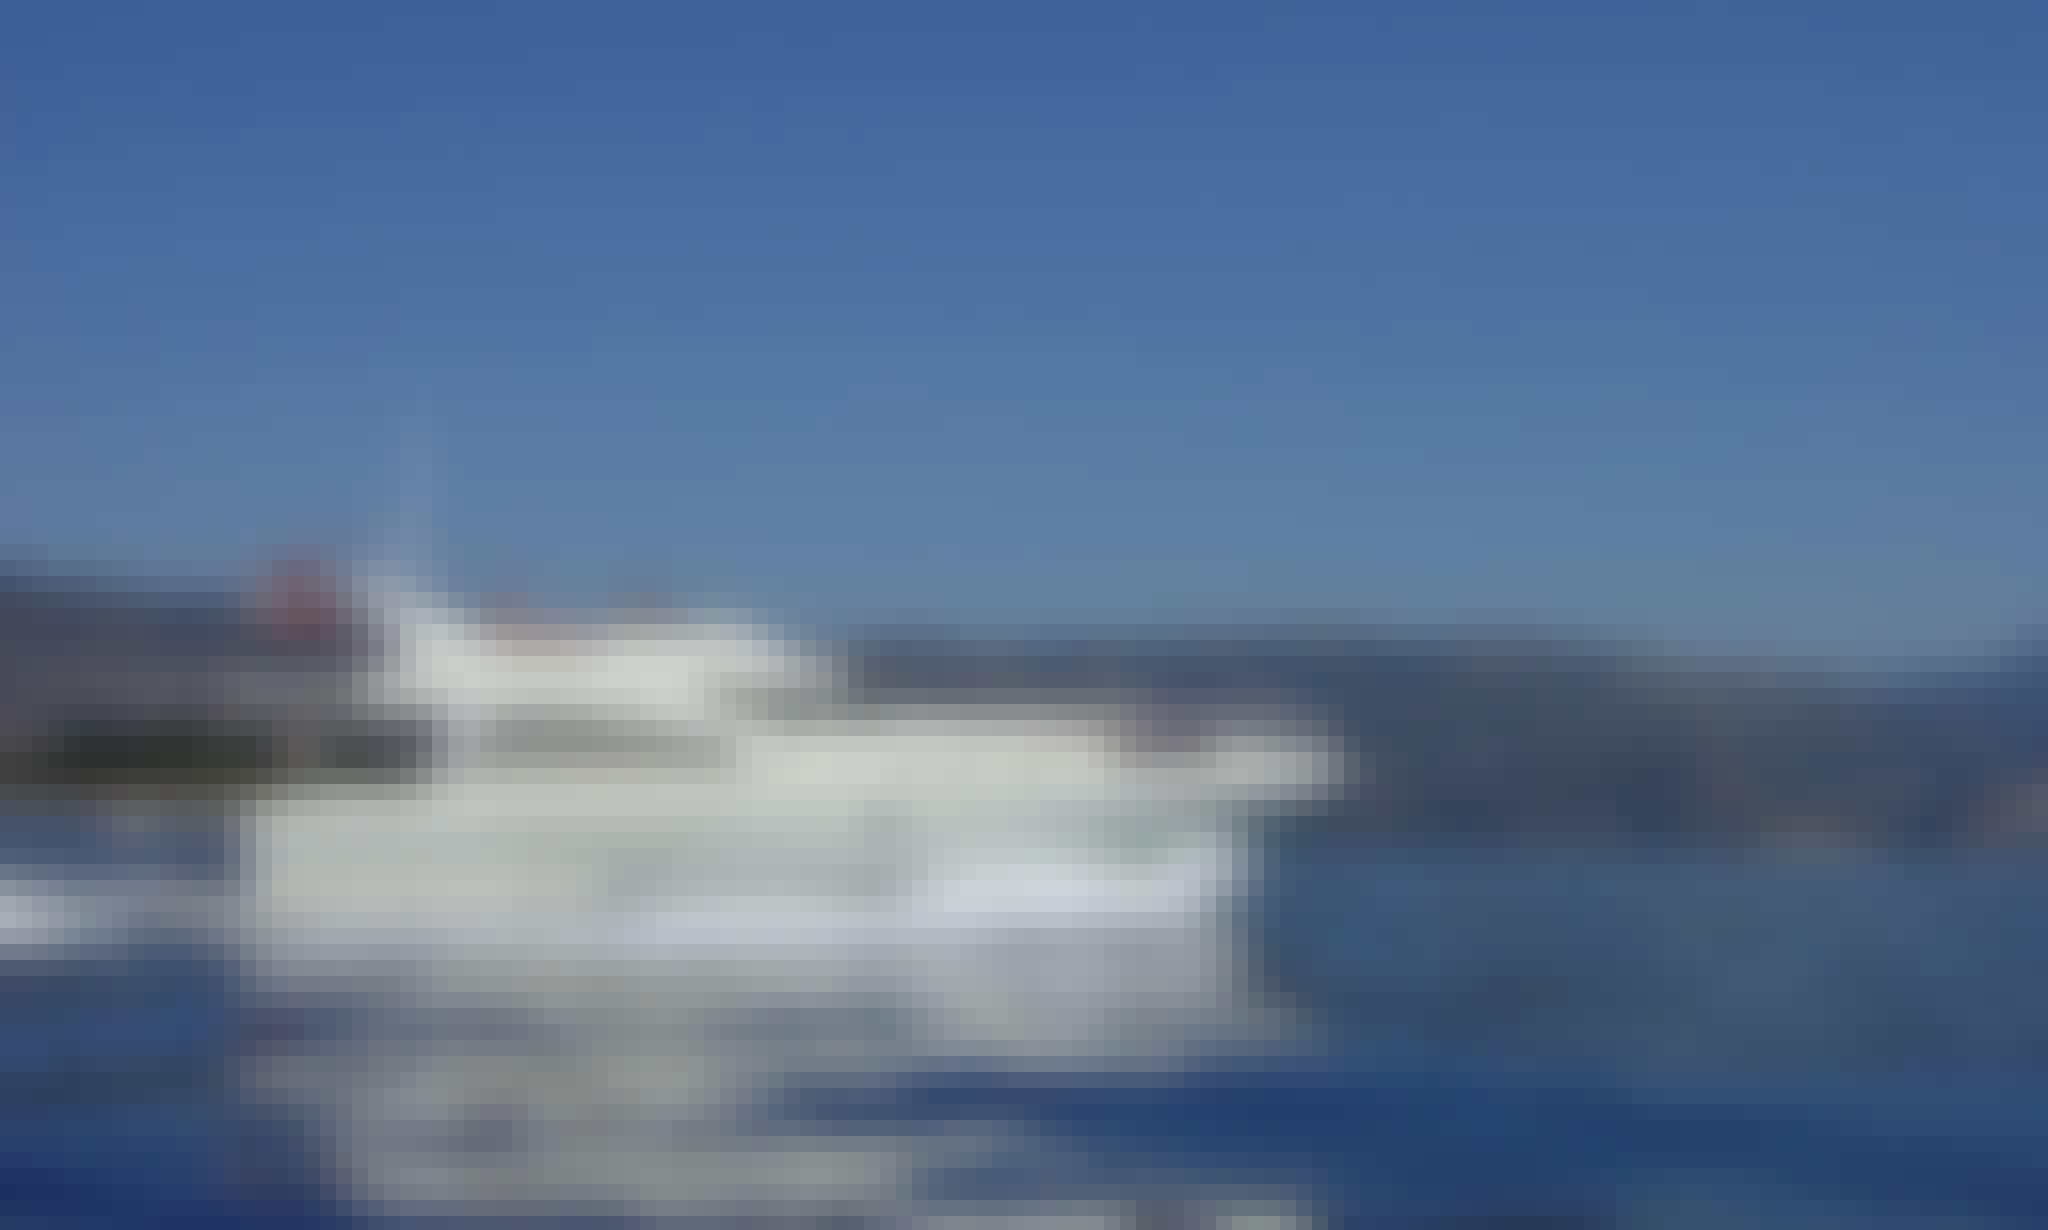 Motor Yacht rental in Menton, France for sleep aboard